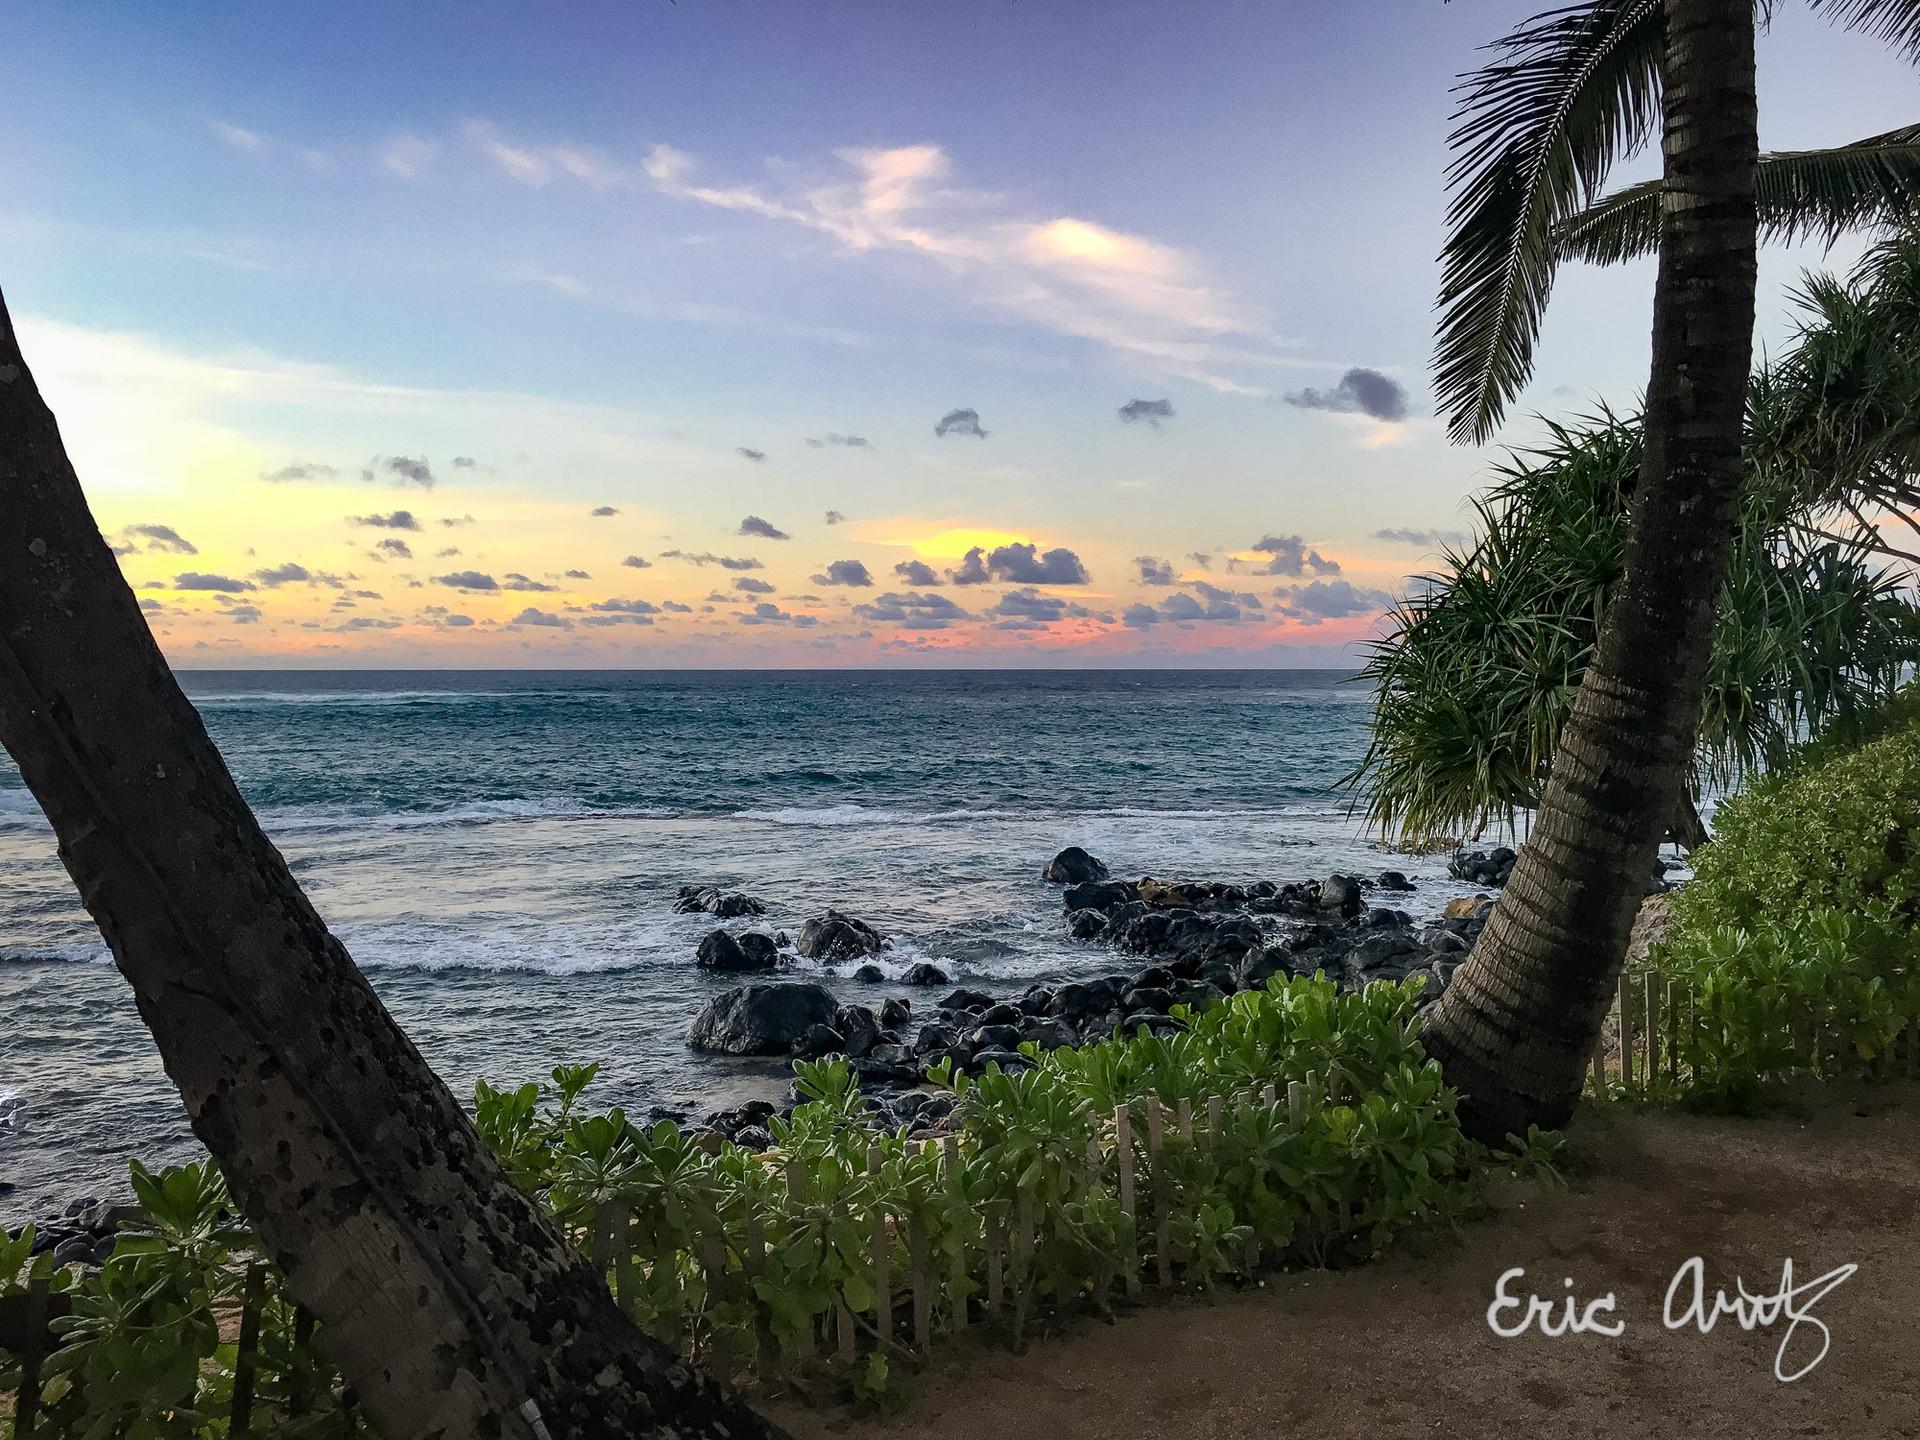 Sunset, Kuau Cove